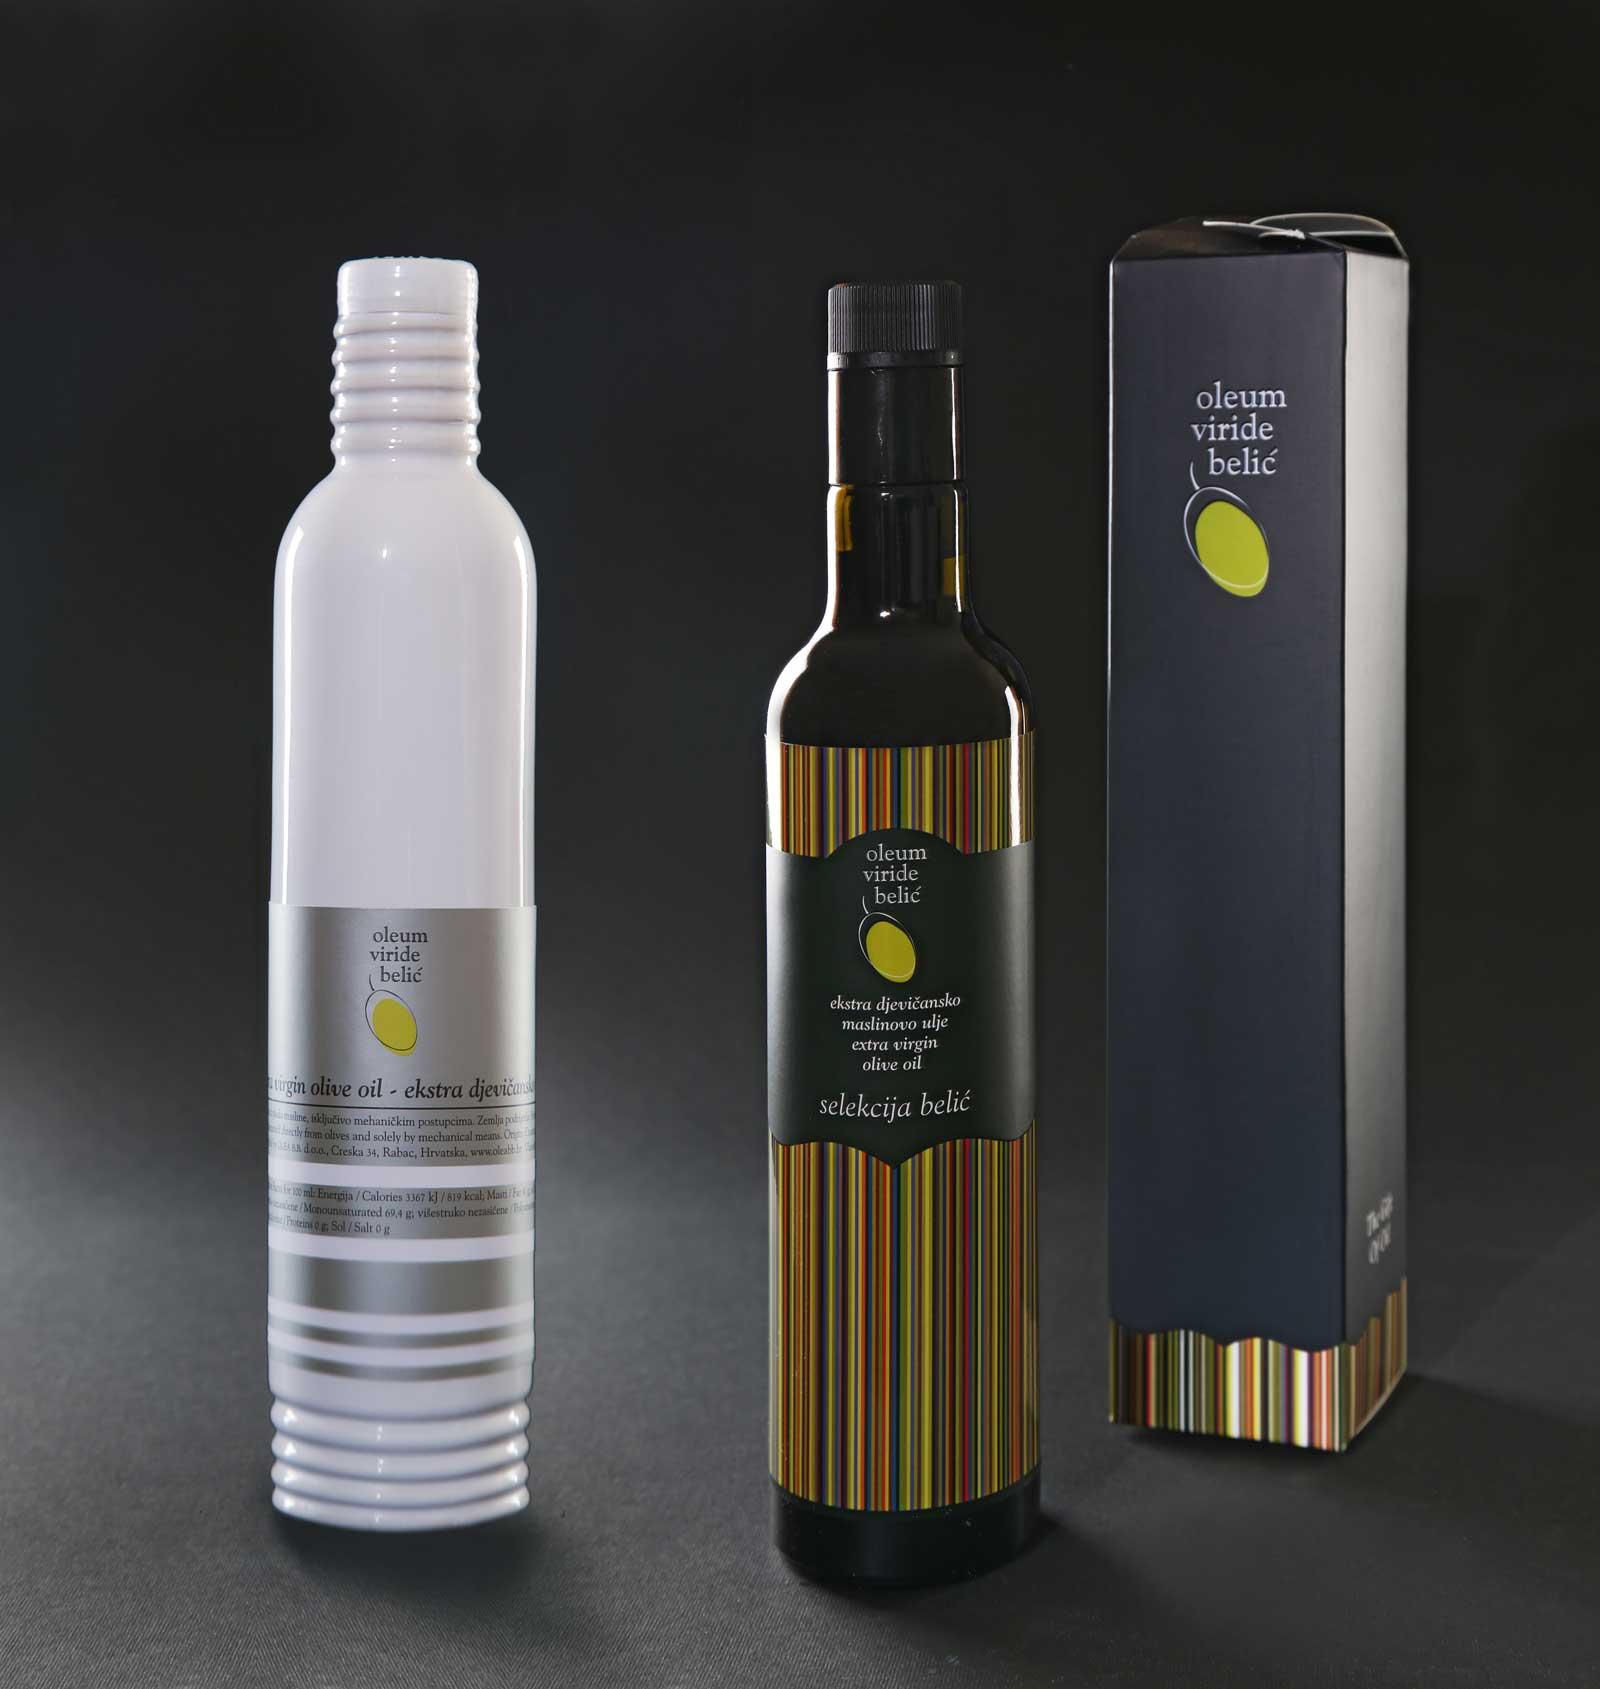 Selekcija Belić, ekstra djevičansko maslinovo ulje, oleum viride belić, istarska ulja, extra virgin olive oil, Istria, Croatia